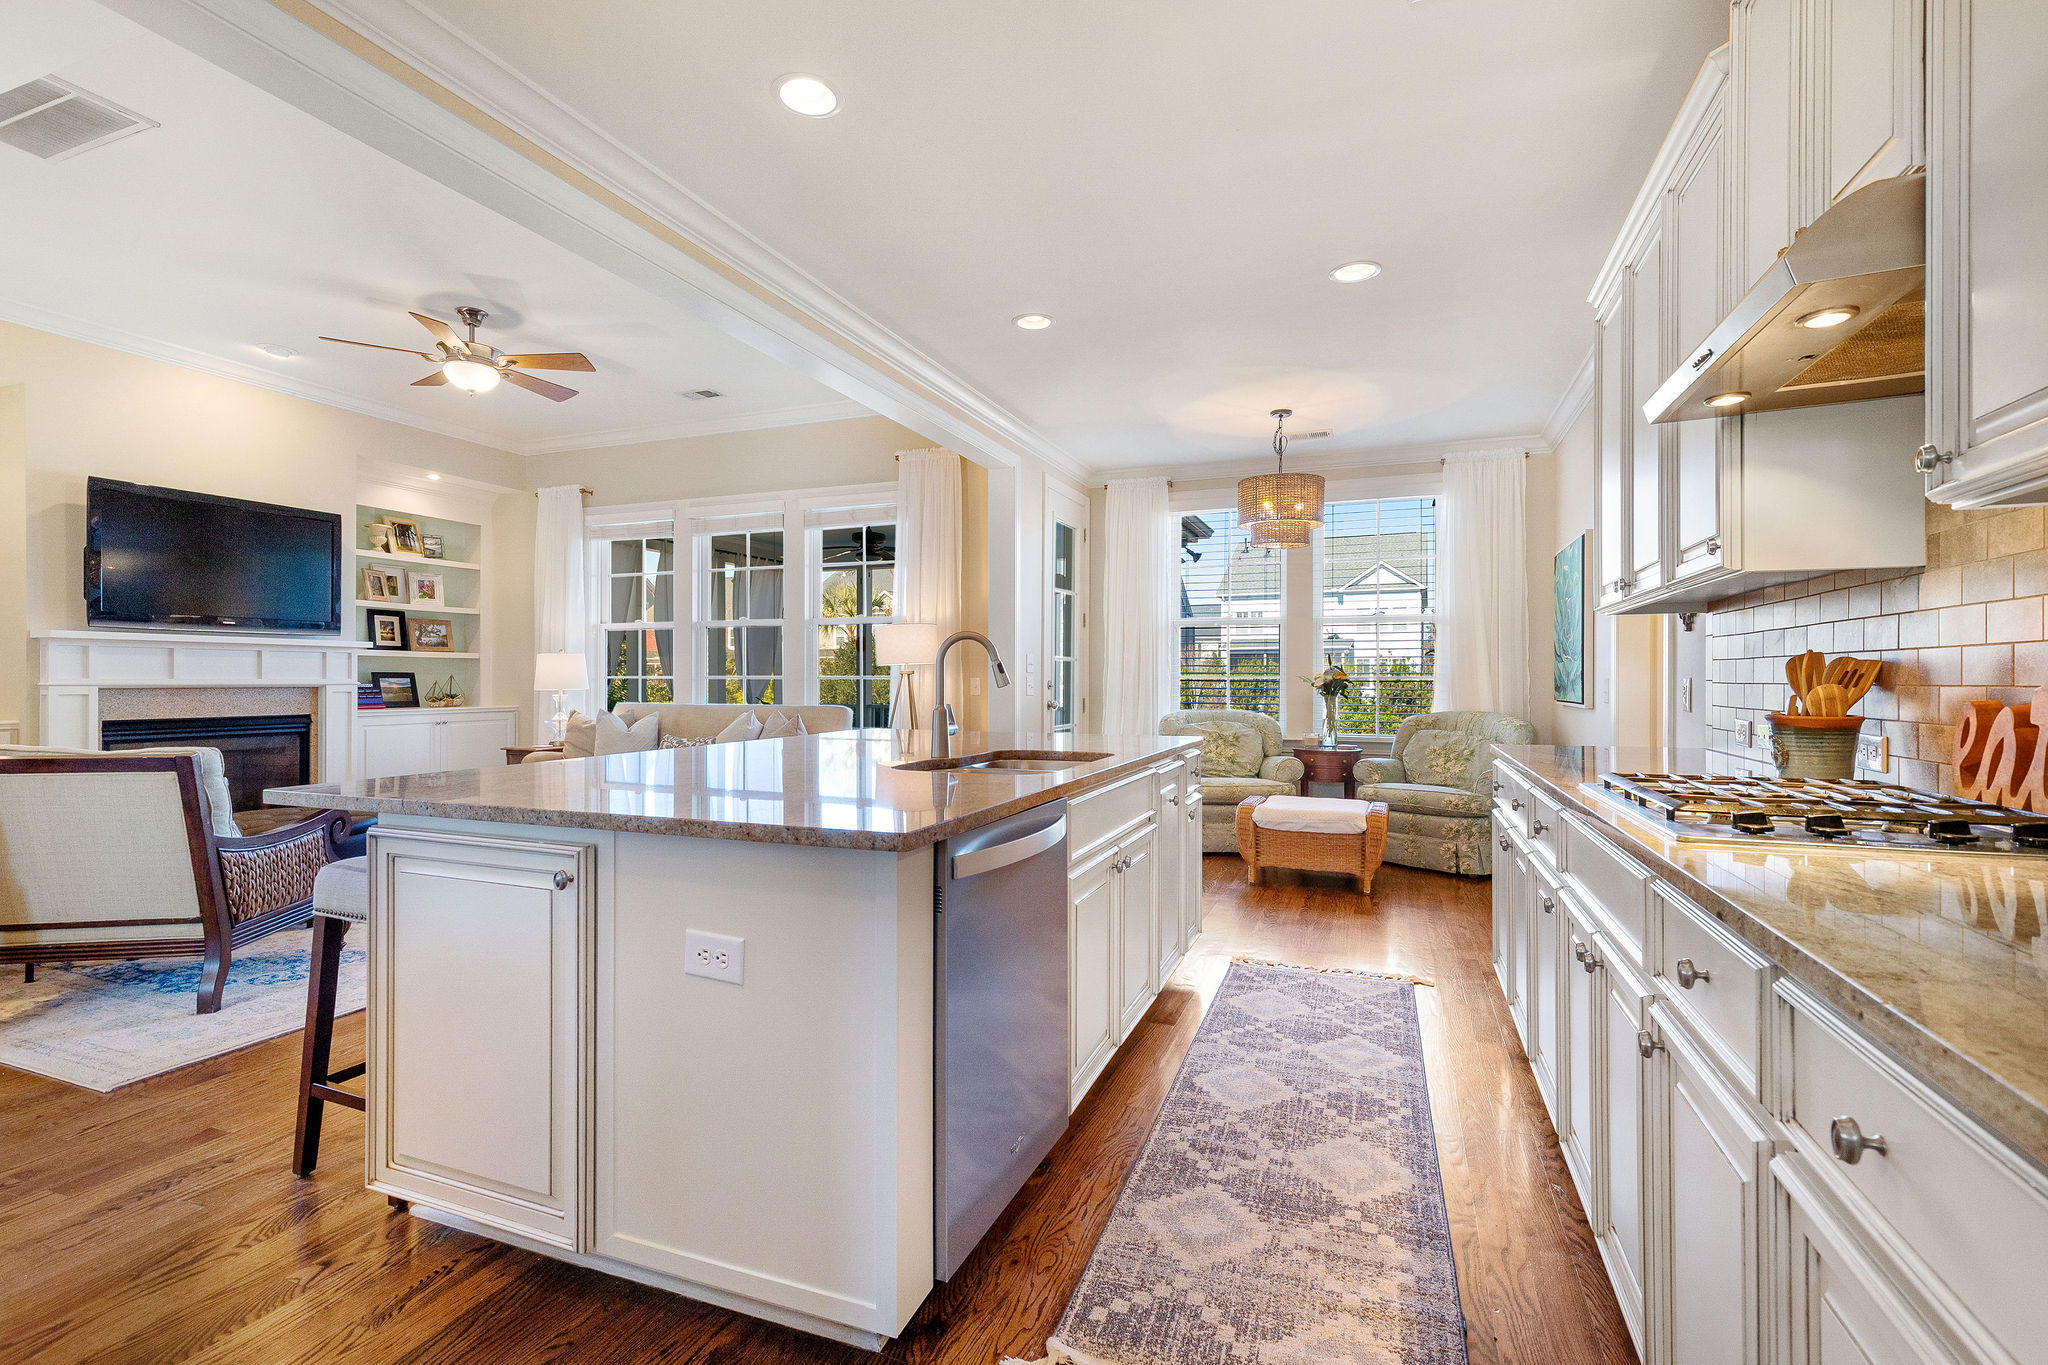 Dunes West Homes For Sale - 3212 Hatchway, Mount Pleasant, SC - 30